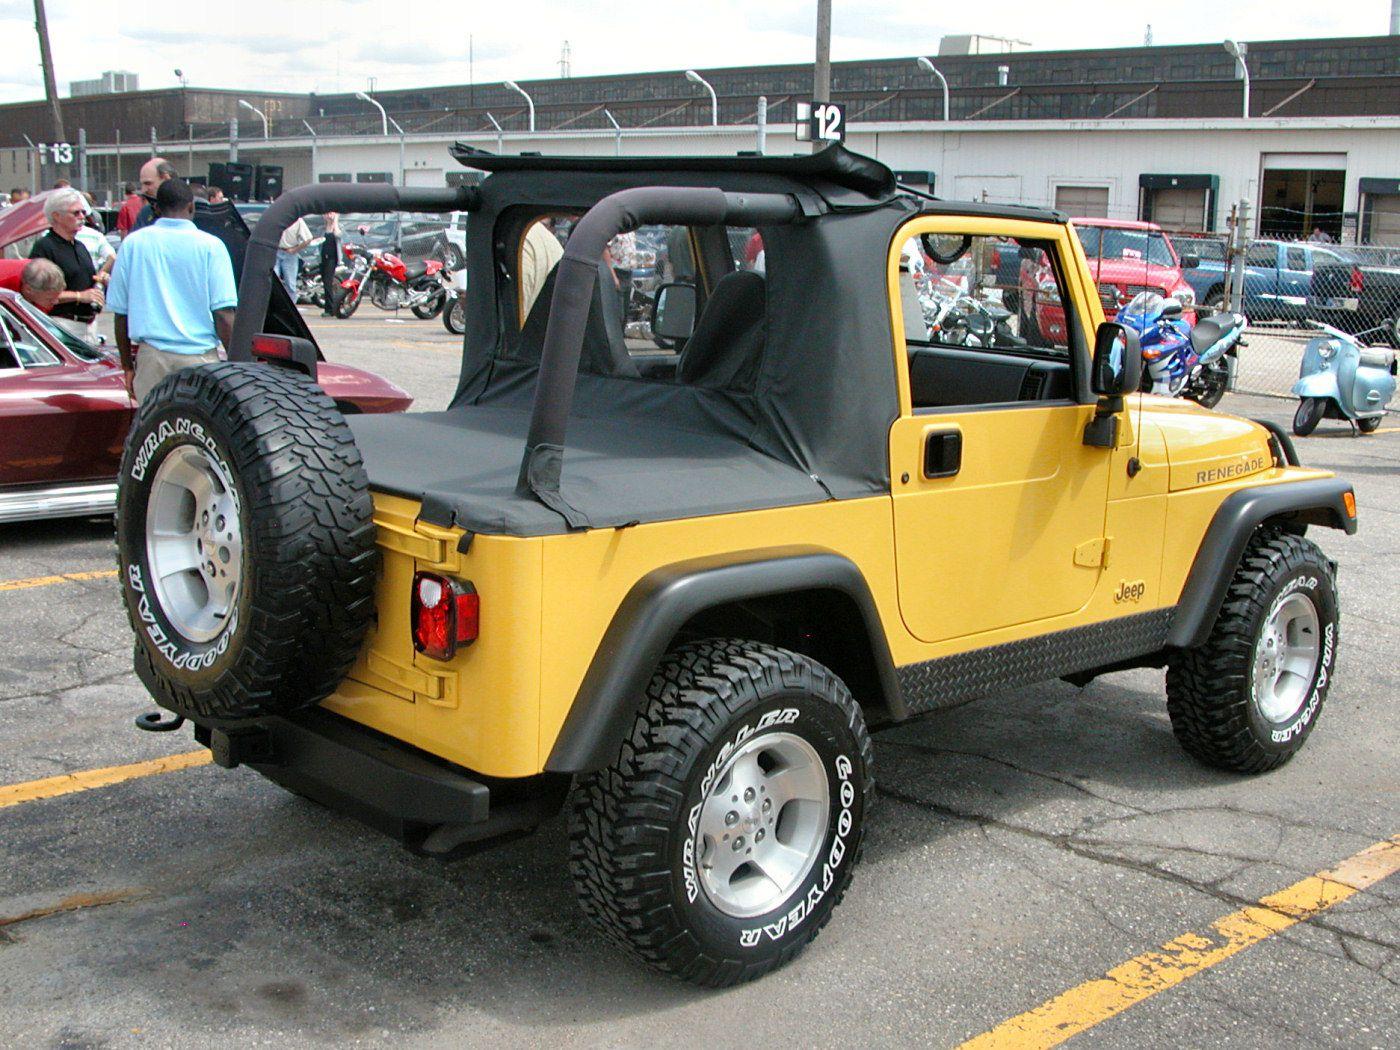 Renegade Fotos De Carros 2000 Jeep Wrangler Jeep Wrangler